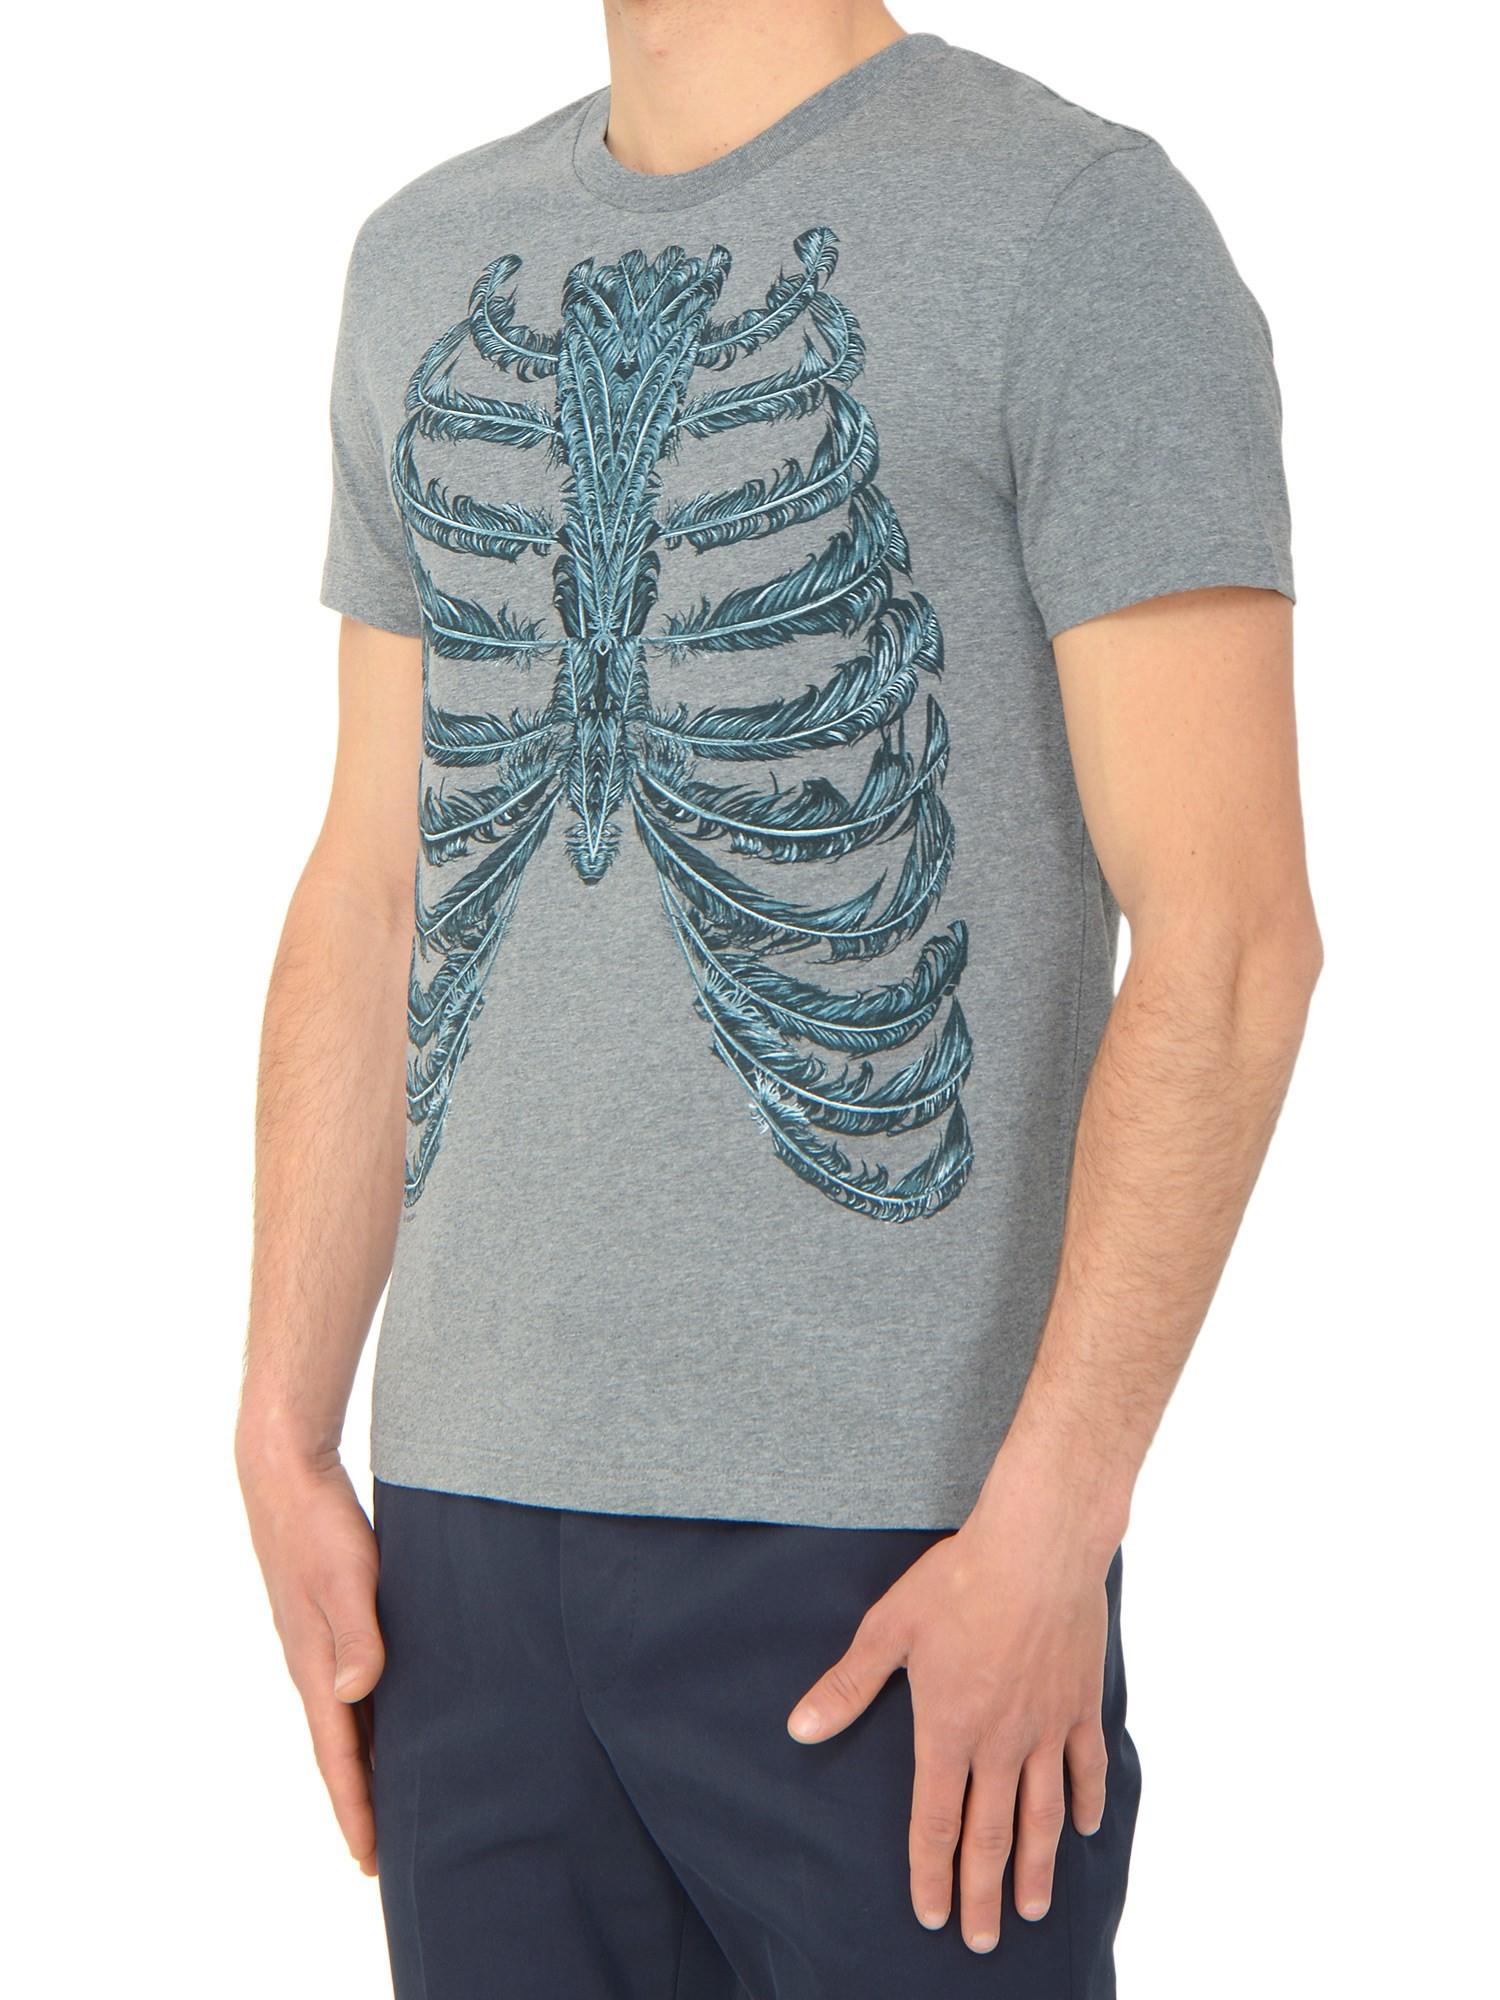 Alexander mcqueen feather skeleton t shirt in gray for men for Alexander mcqueen shirt men